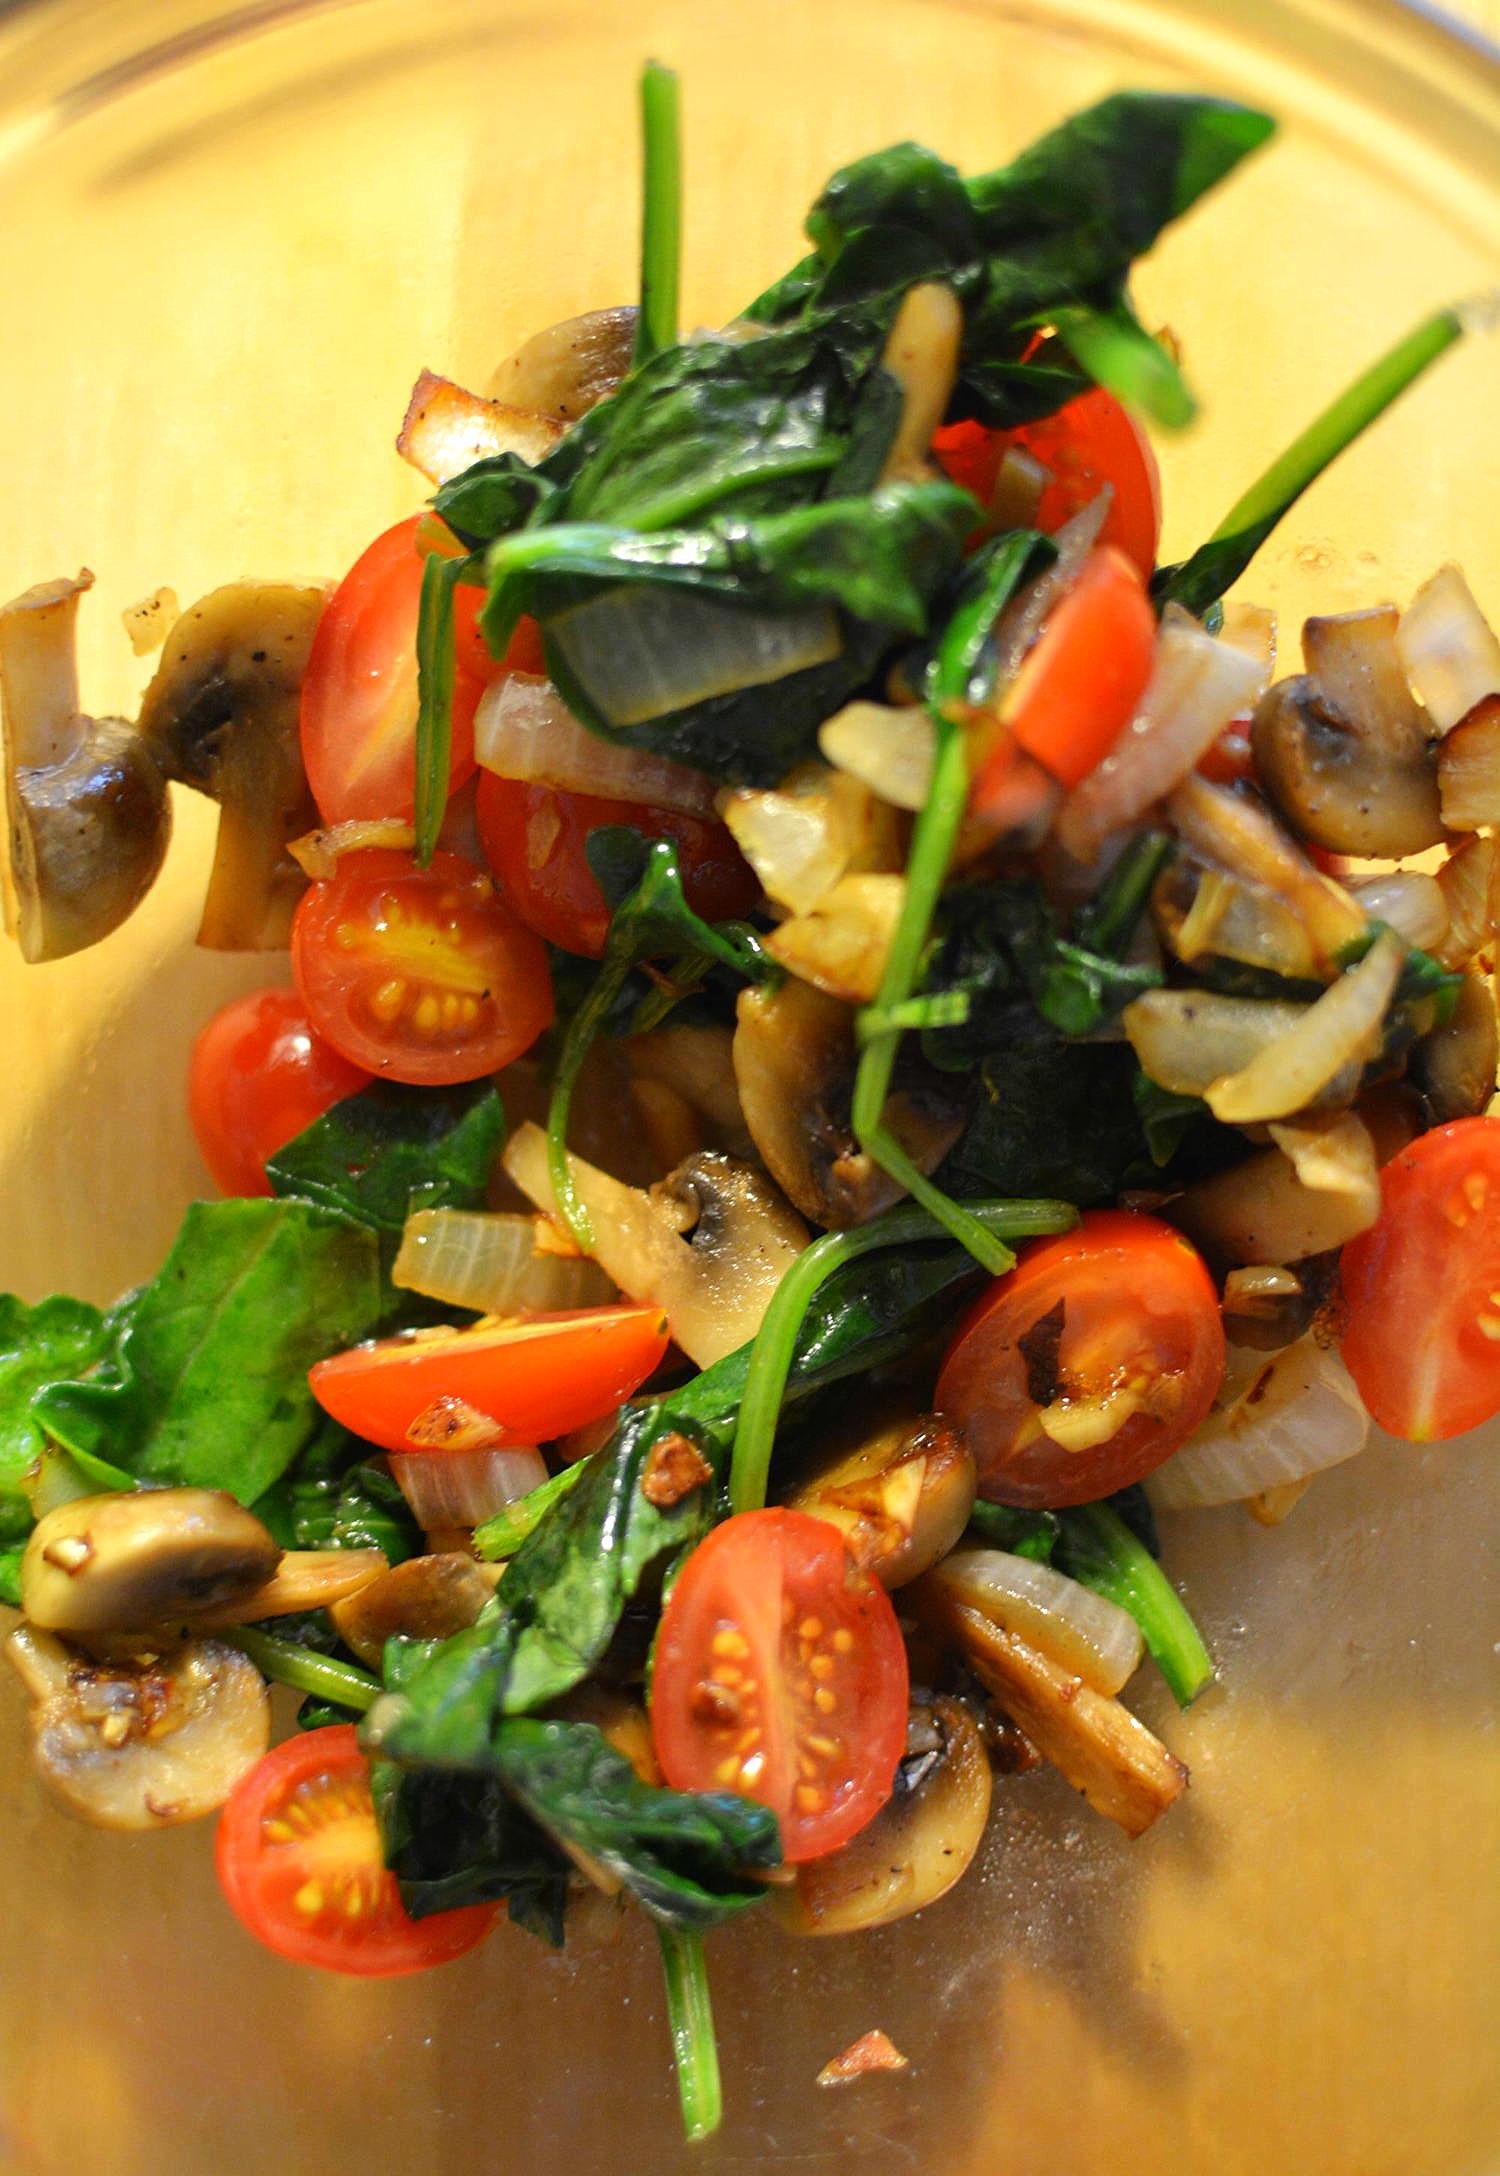 sauteed onion, garlic, mushroom, spinach + tomoato